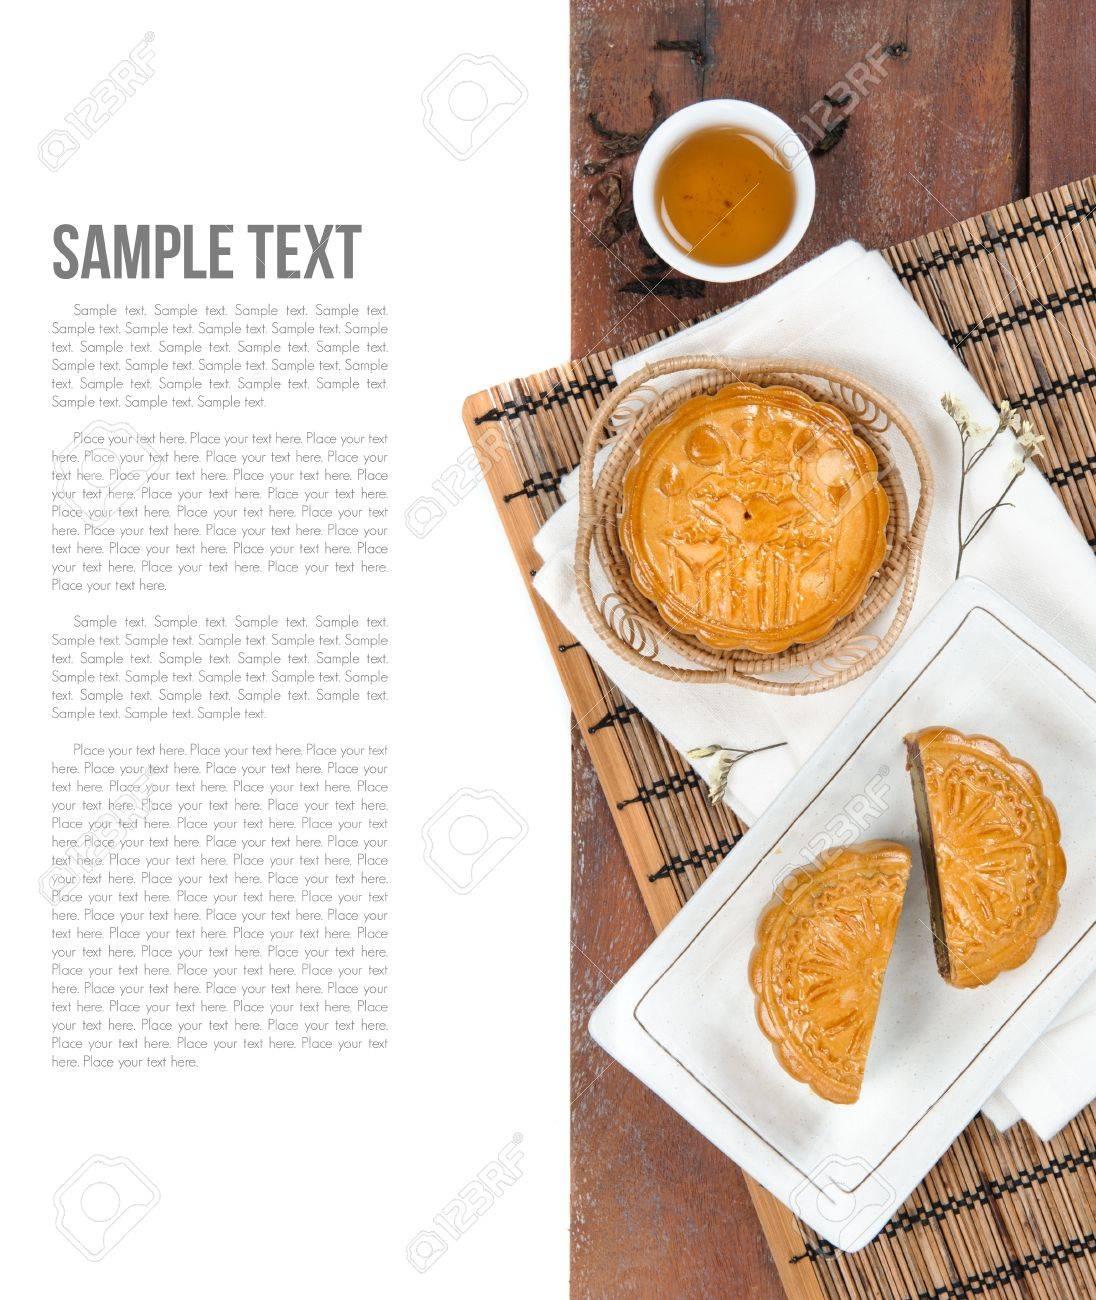 Mooncake, Chinese Mid-autumn festival dessert - 38444539